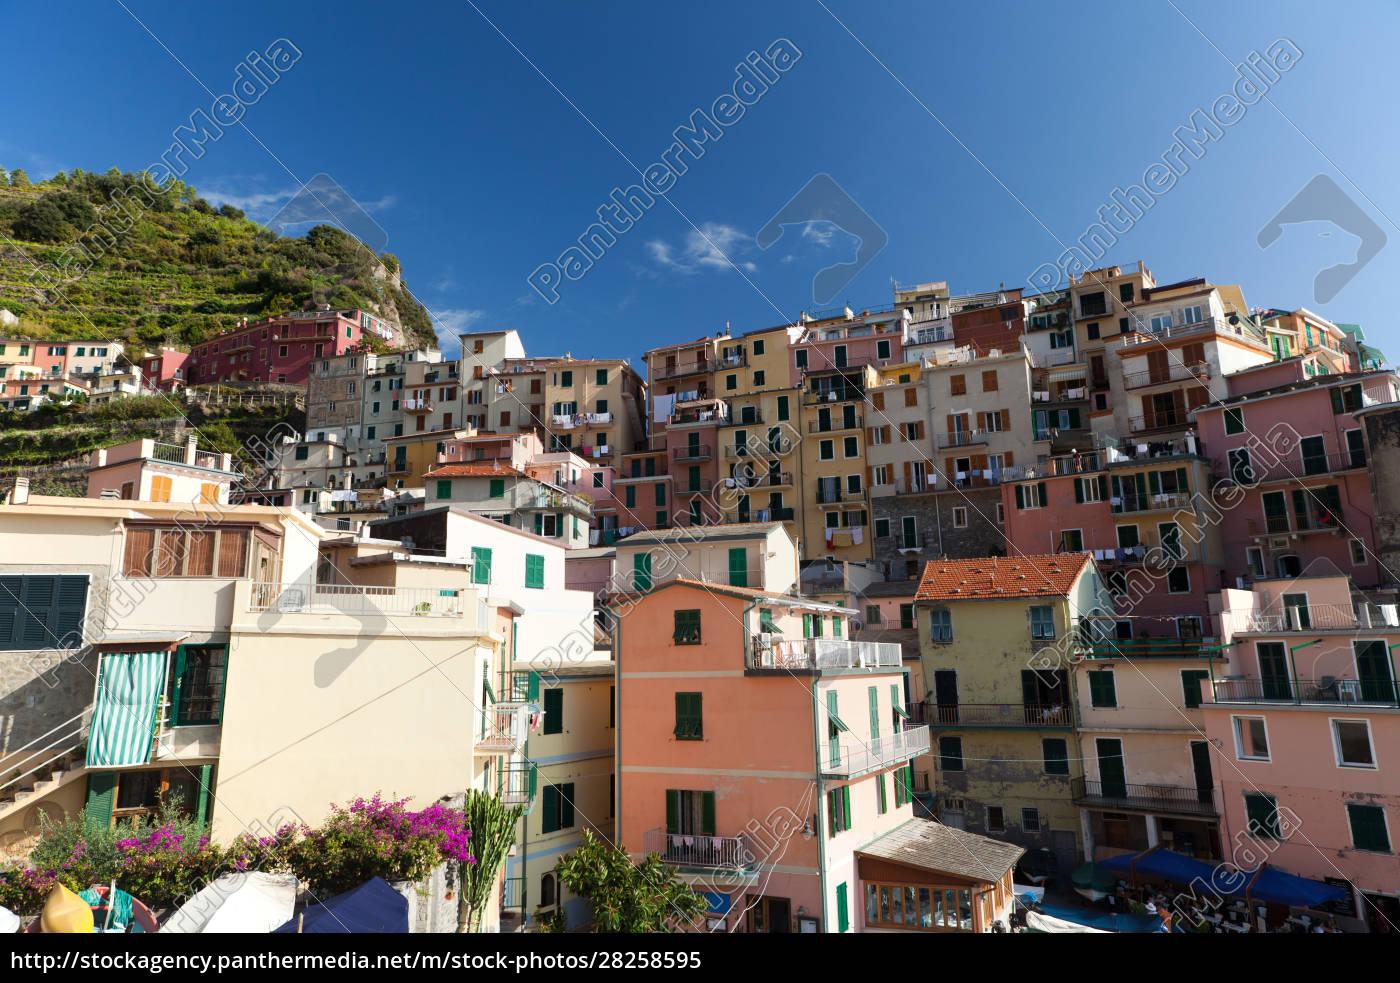 manarola, -, one, of, the, cities - 28258595